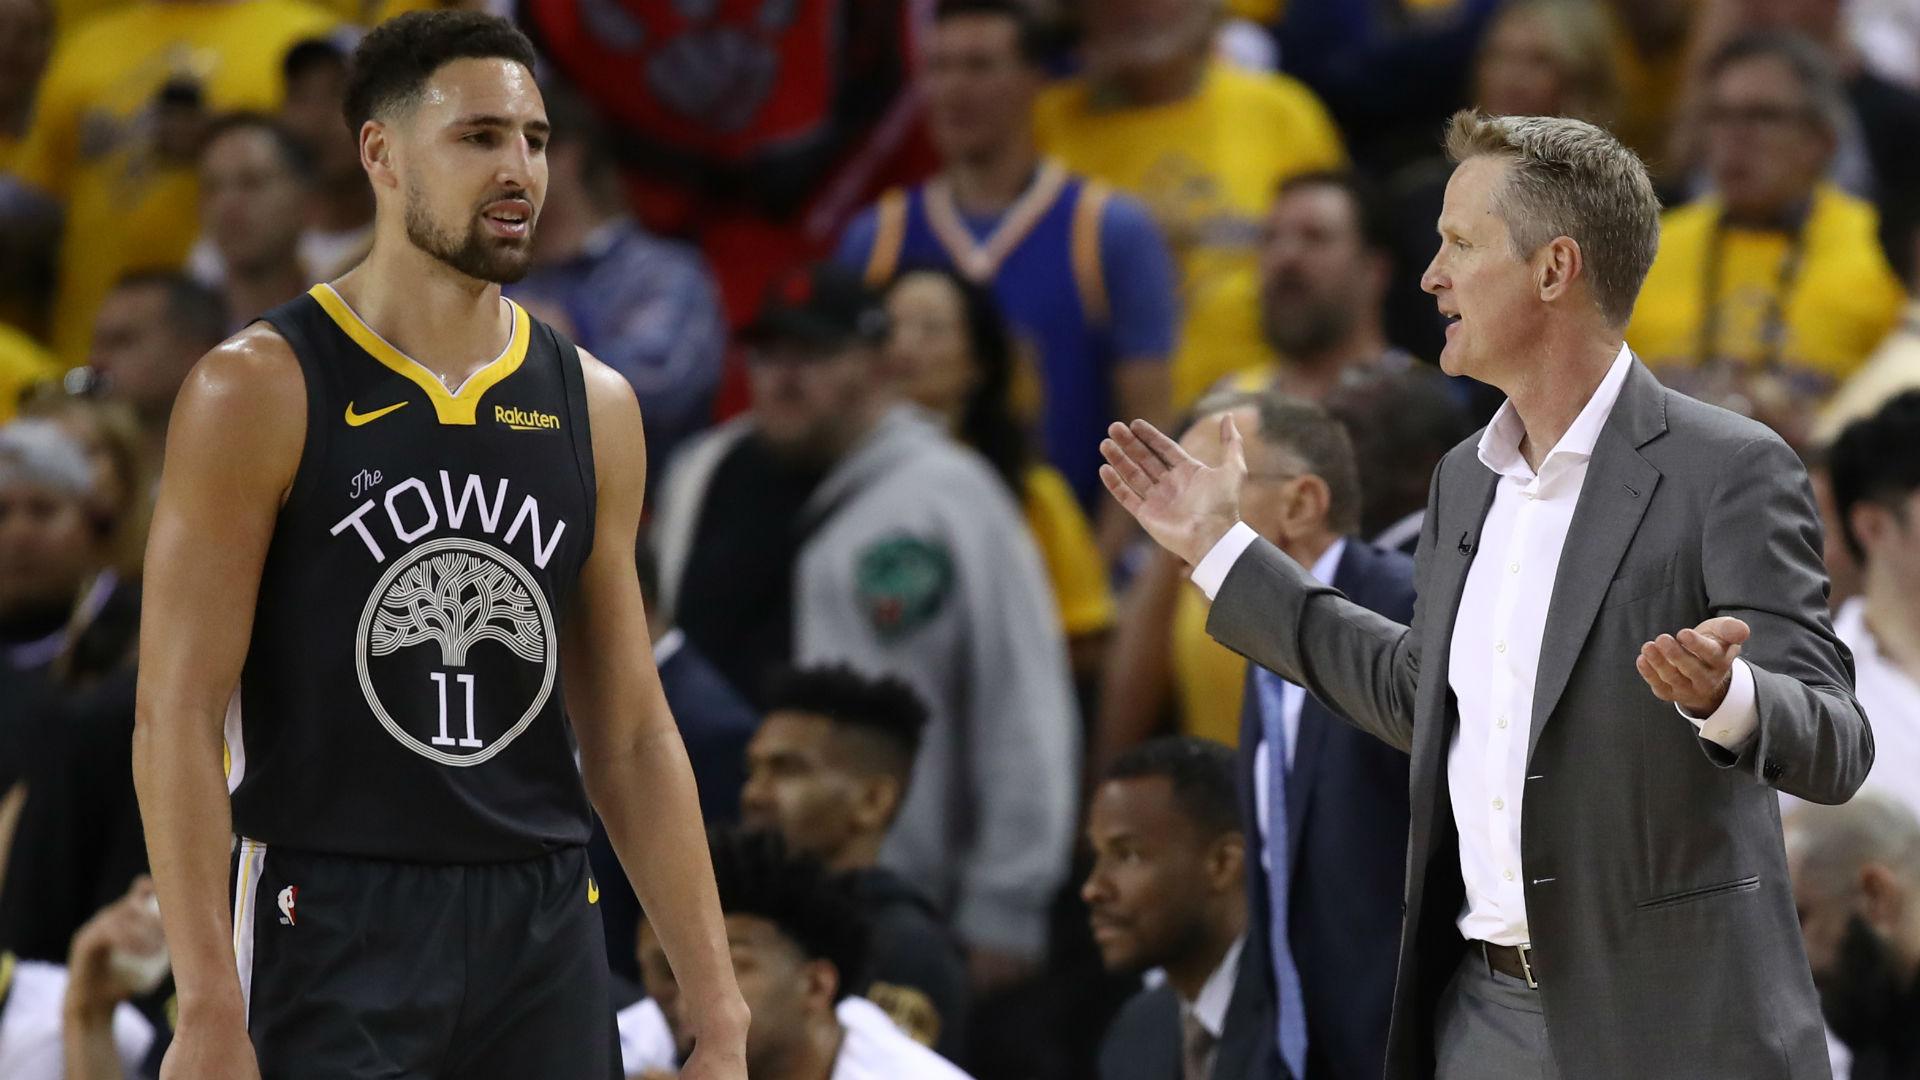 Warriors star Klay Thompson 'unlikely' to play this season, says Steve Kerr